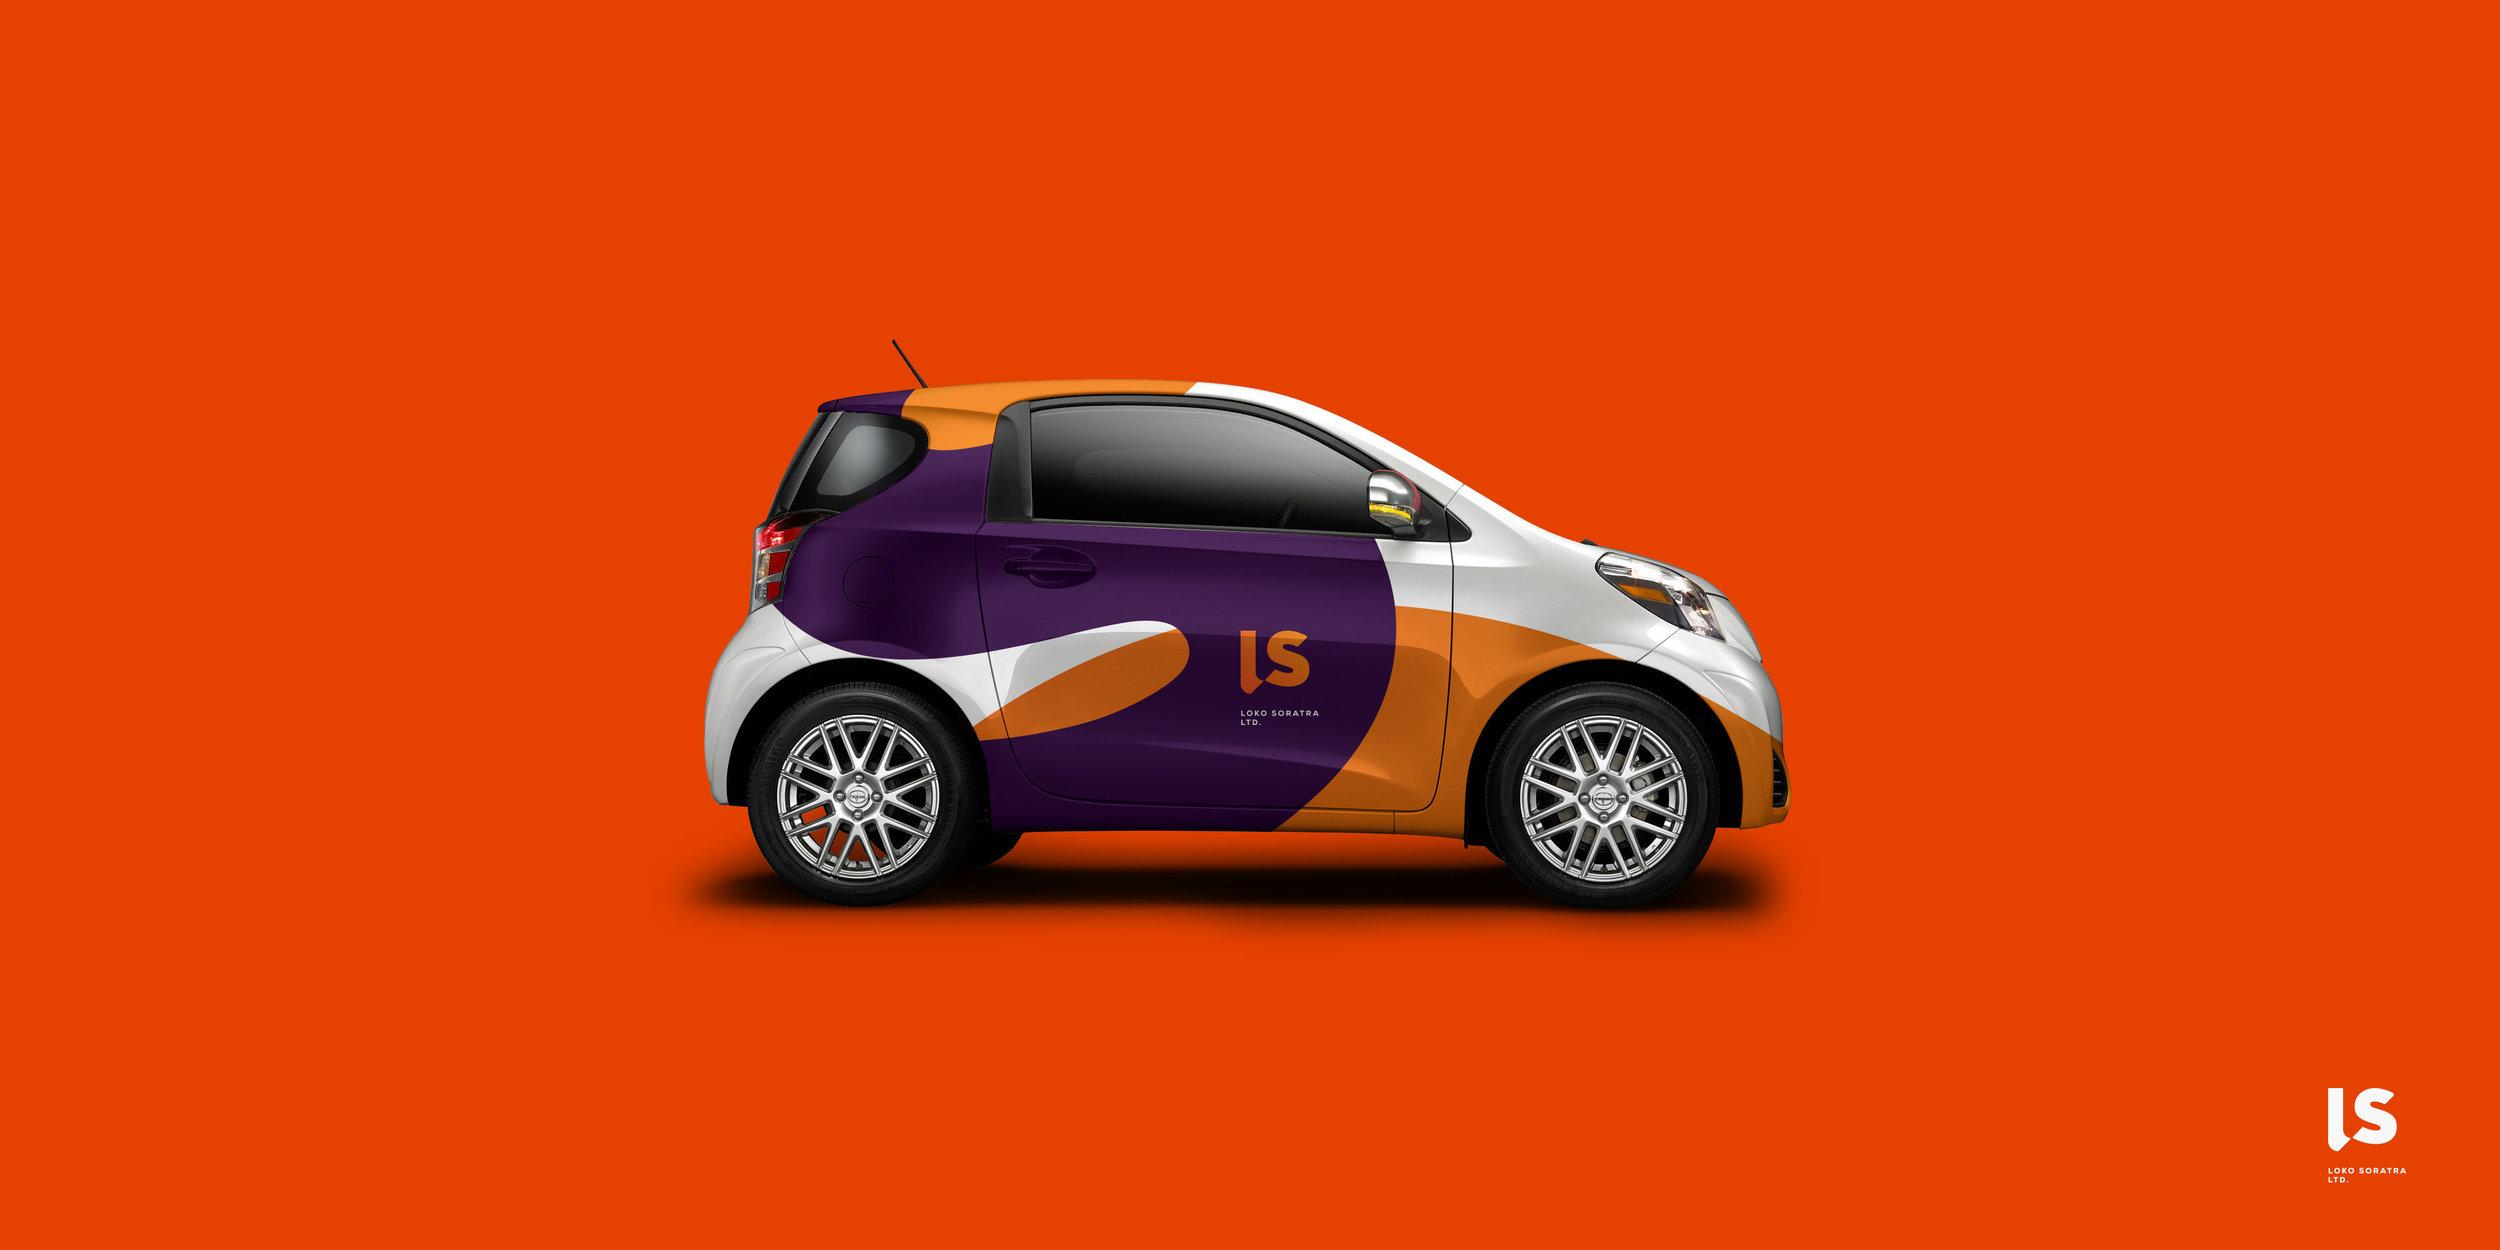 LS_Car_1.jpg